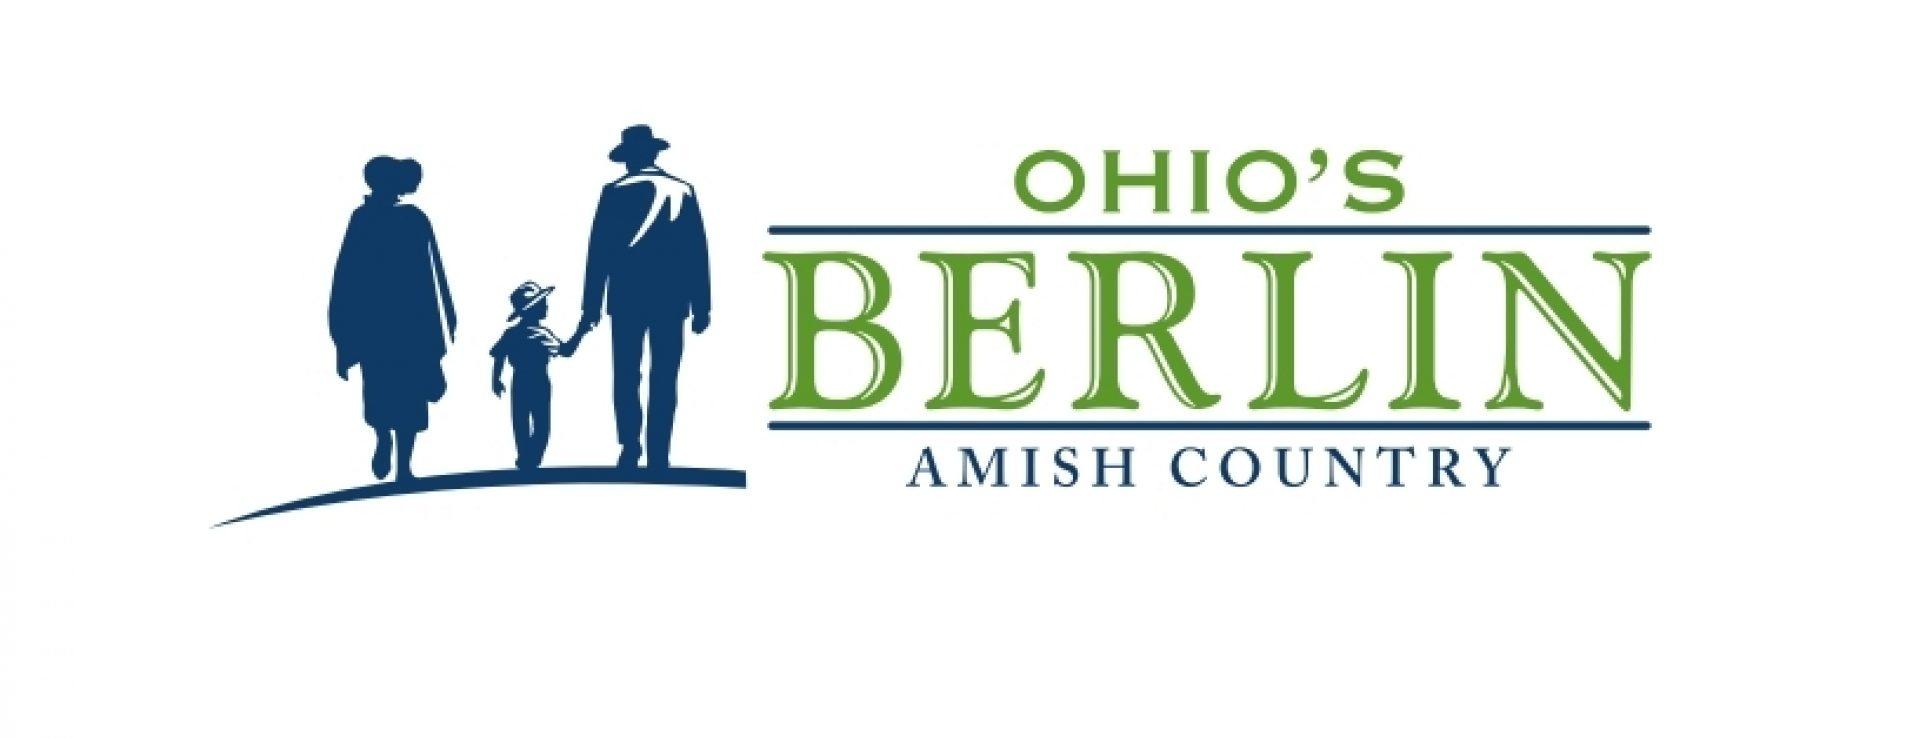 Berlin Main Street Merchants Ohio S Amish Country